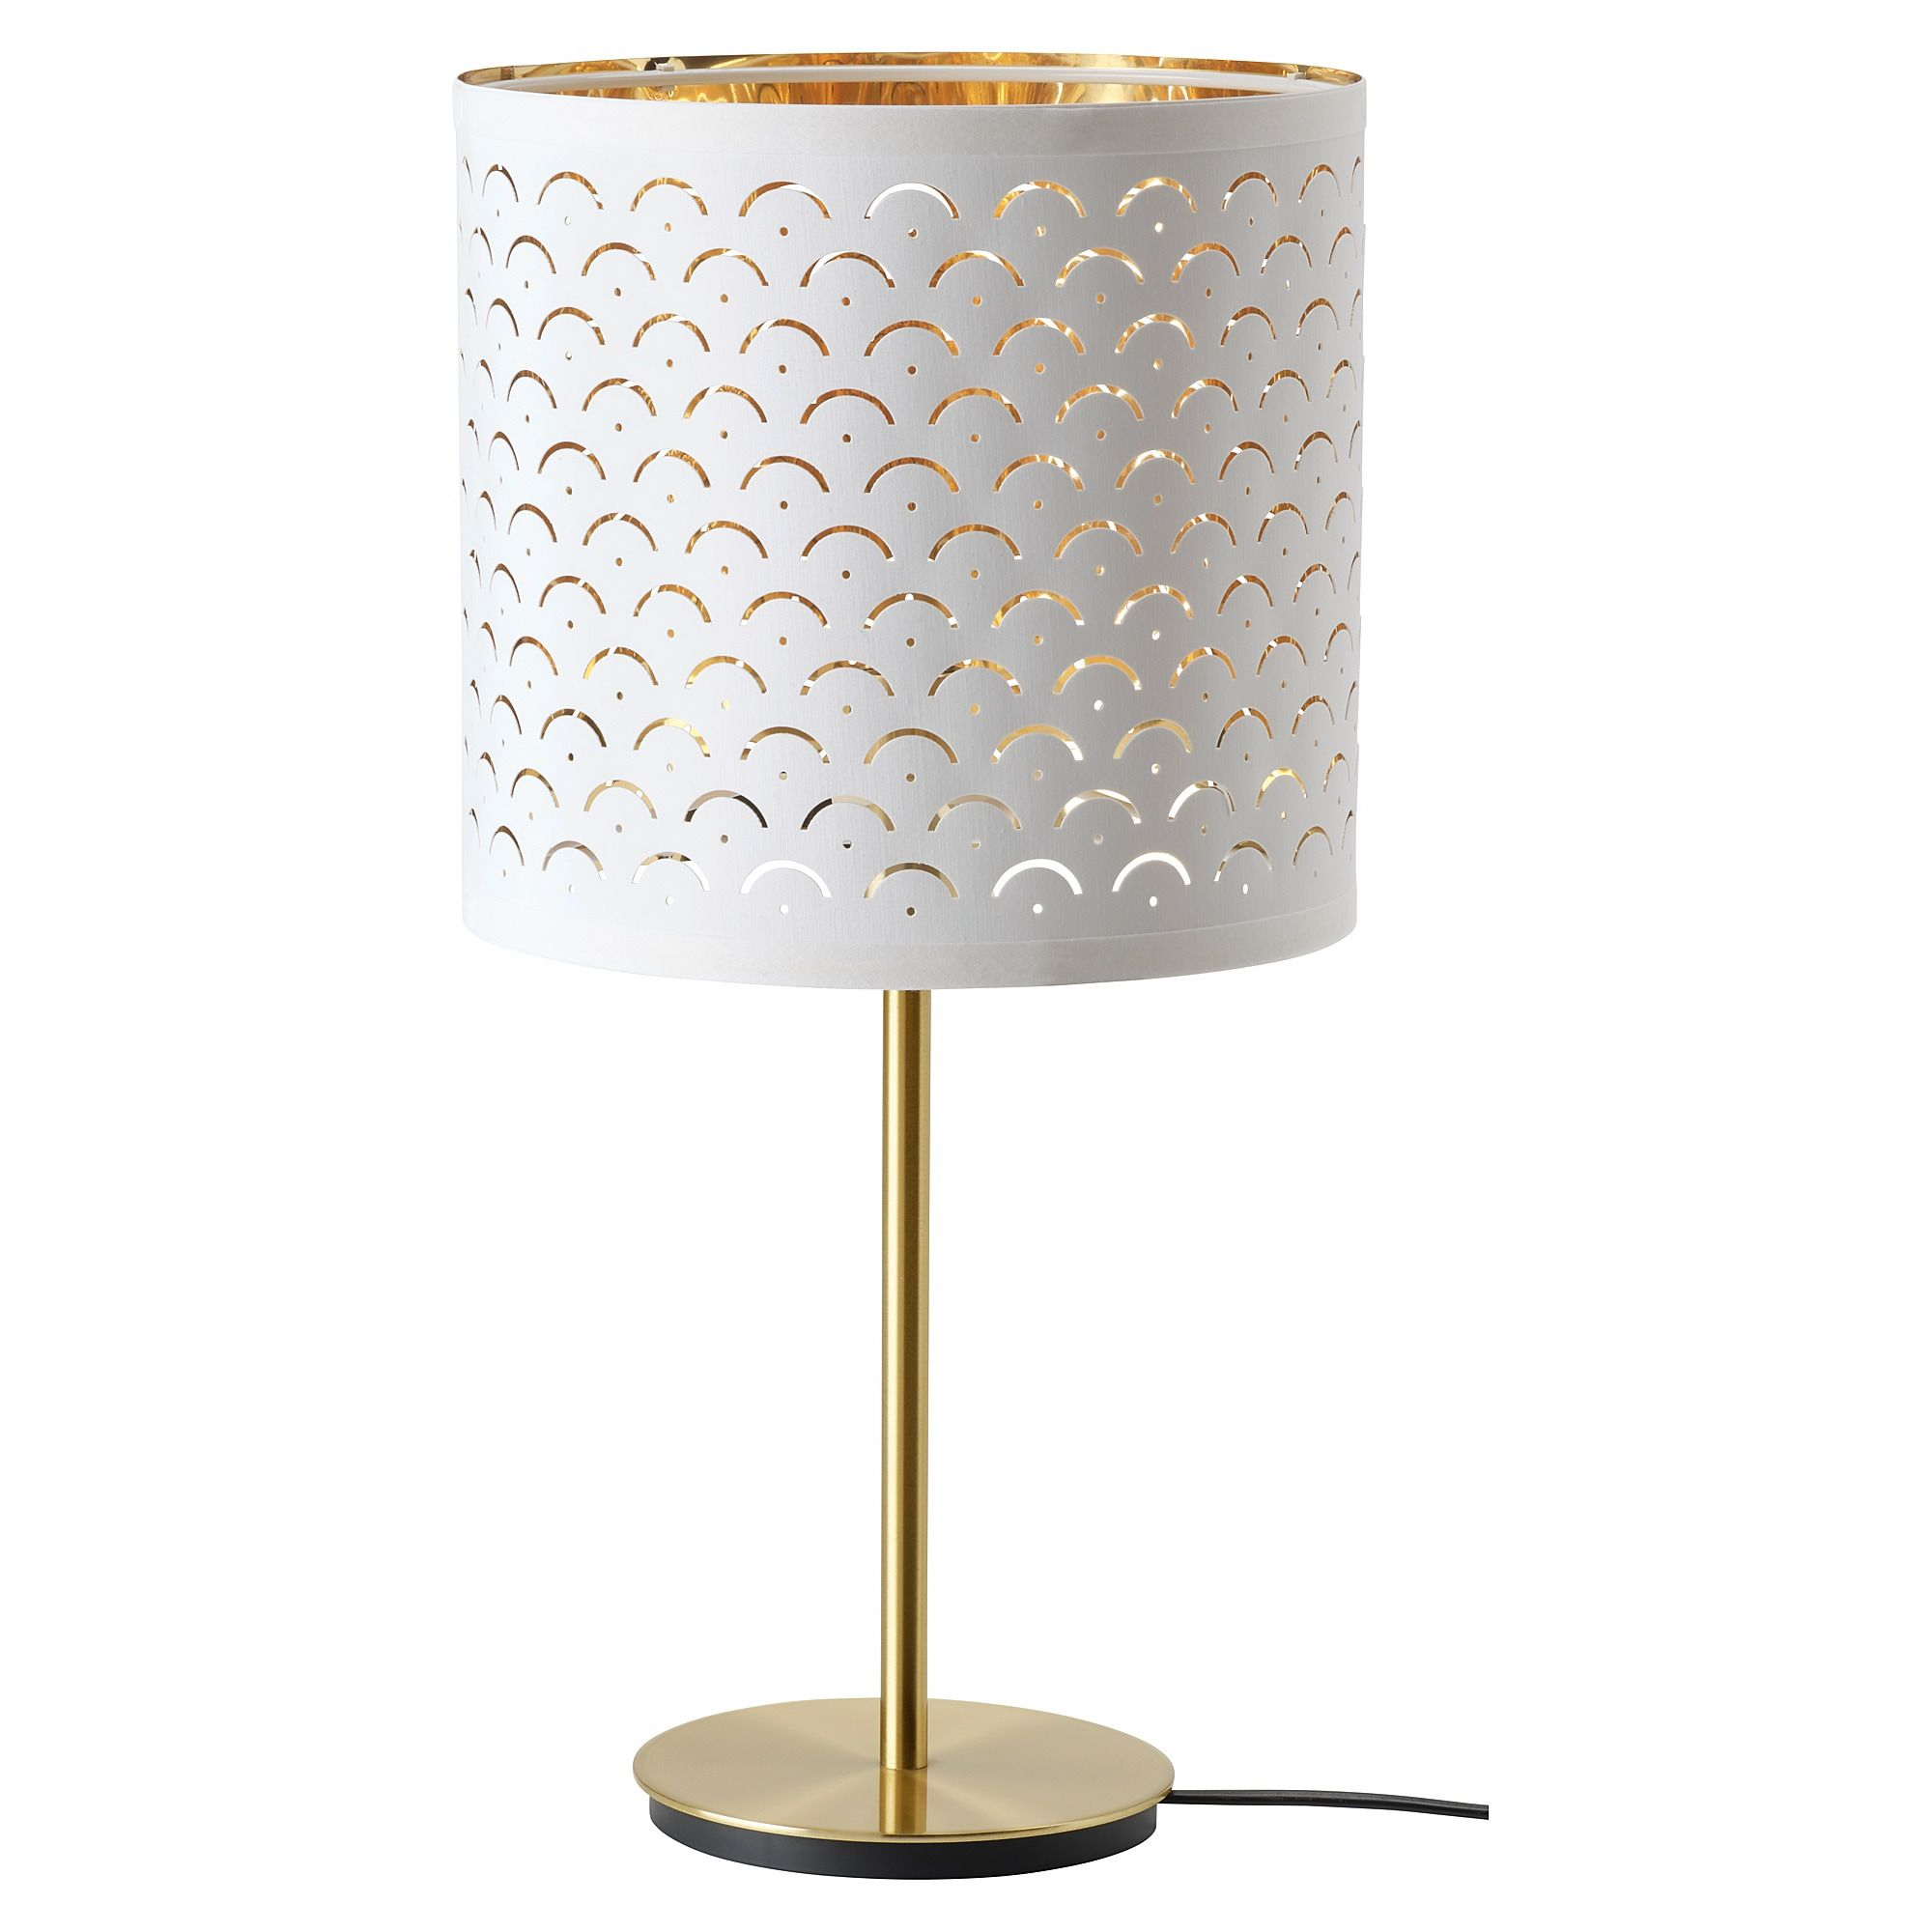 Nymo Skaftet White Brass Brass Table Lamp 24x30 Cm Ikea In 2020 White Table Lamp Lamp Table Lamp